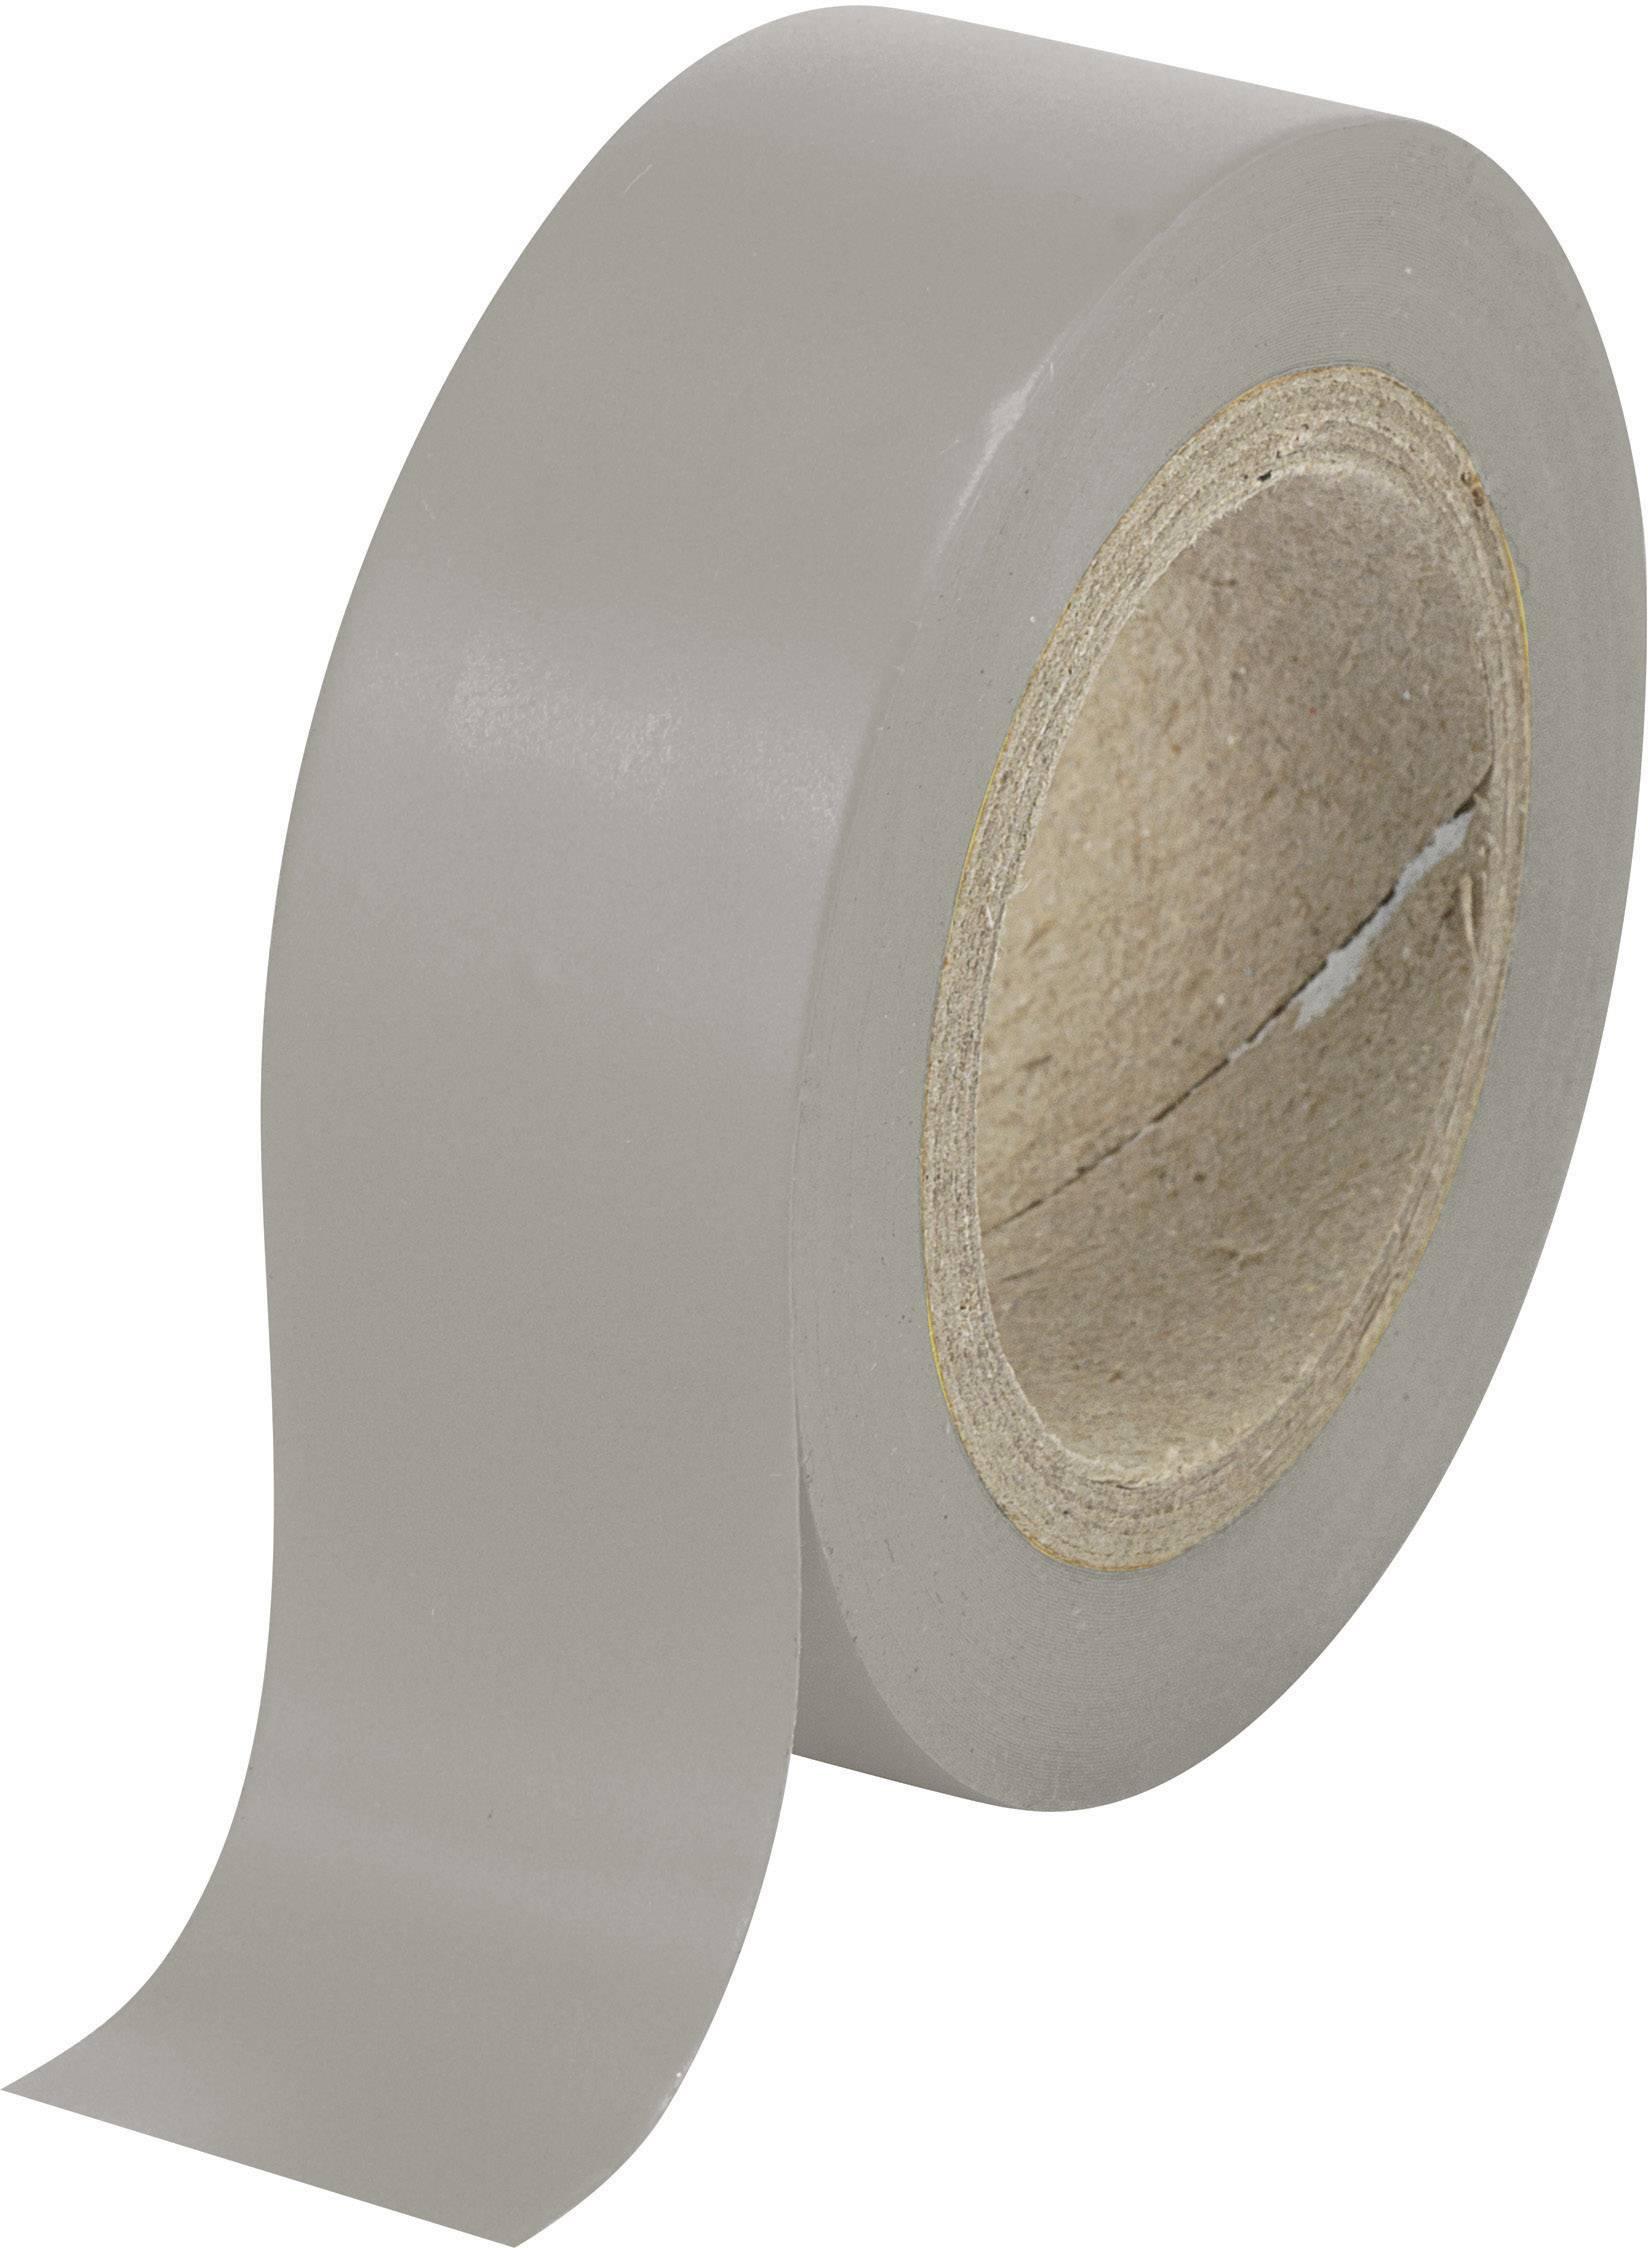 Izolačná páska TRU COMPONENTS SW12-014GY 1564122, (d x š) 25 m x 19 mm, sivá, 1 roliek